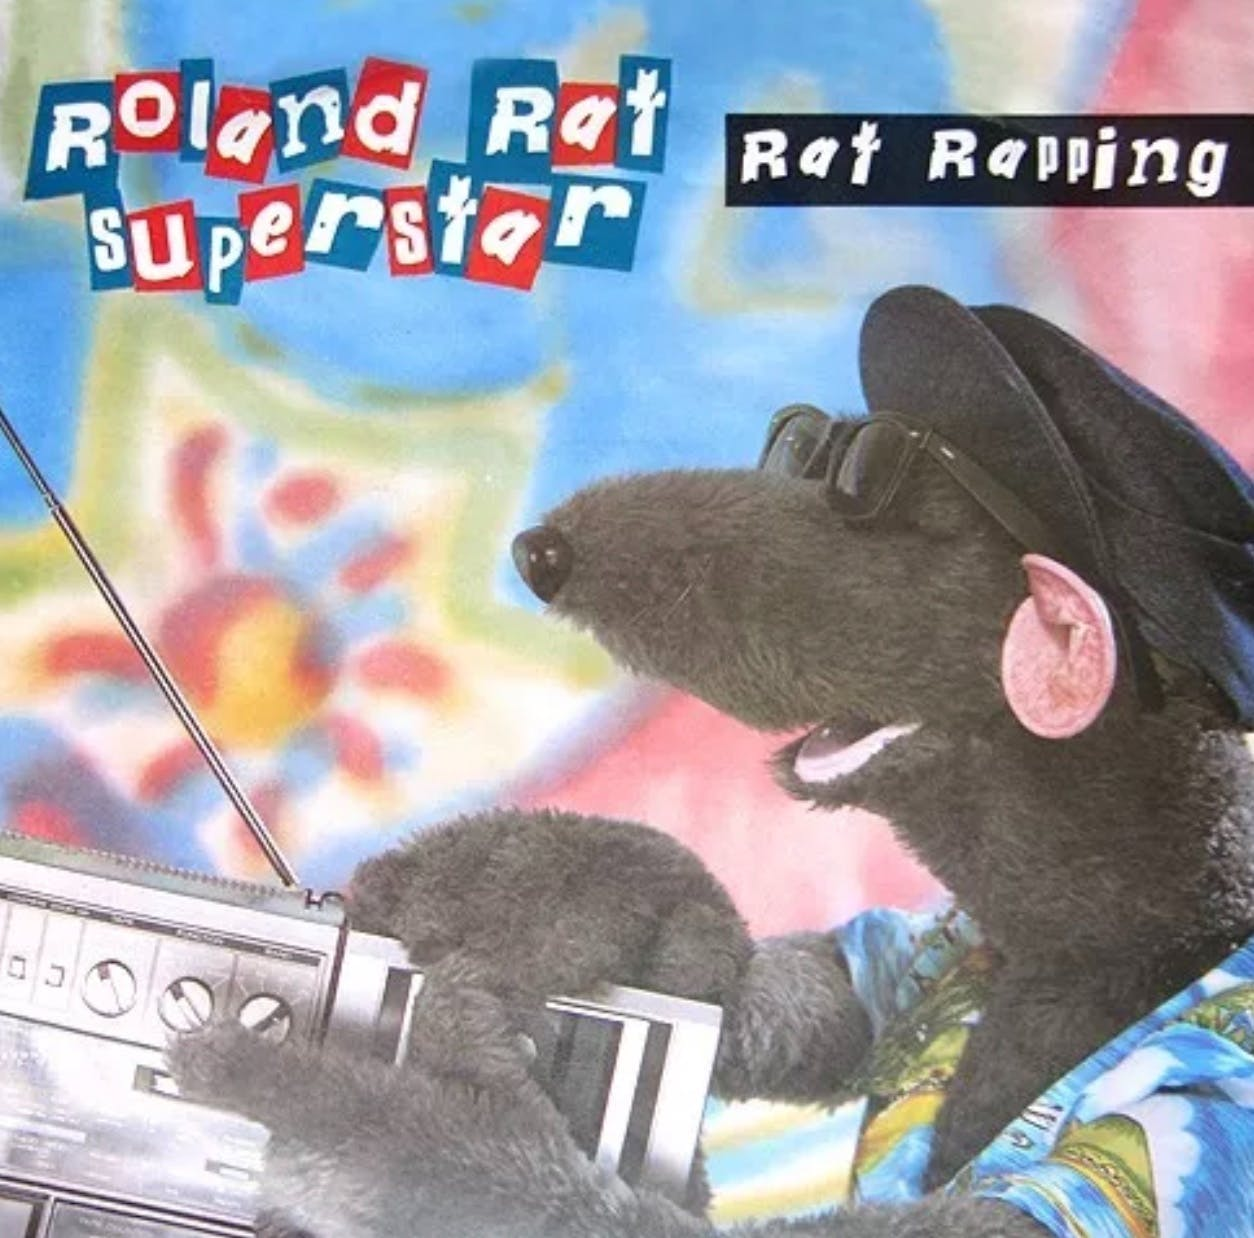 Roland Rat, Rat Rapping single